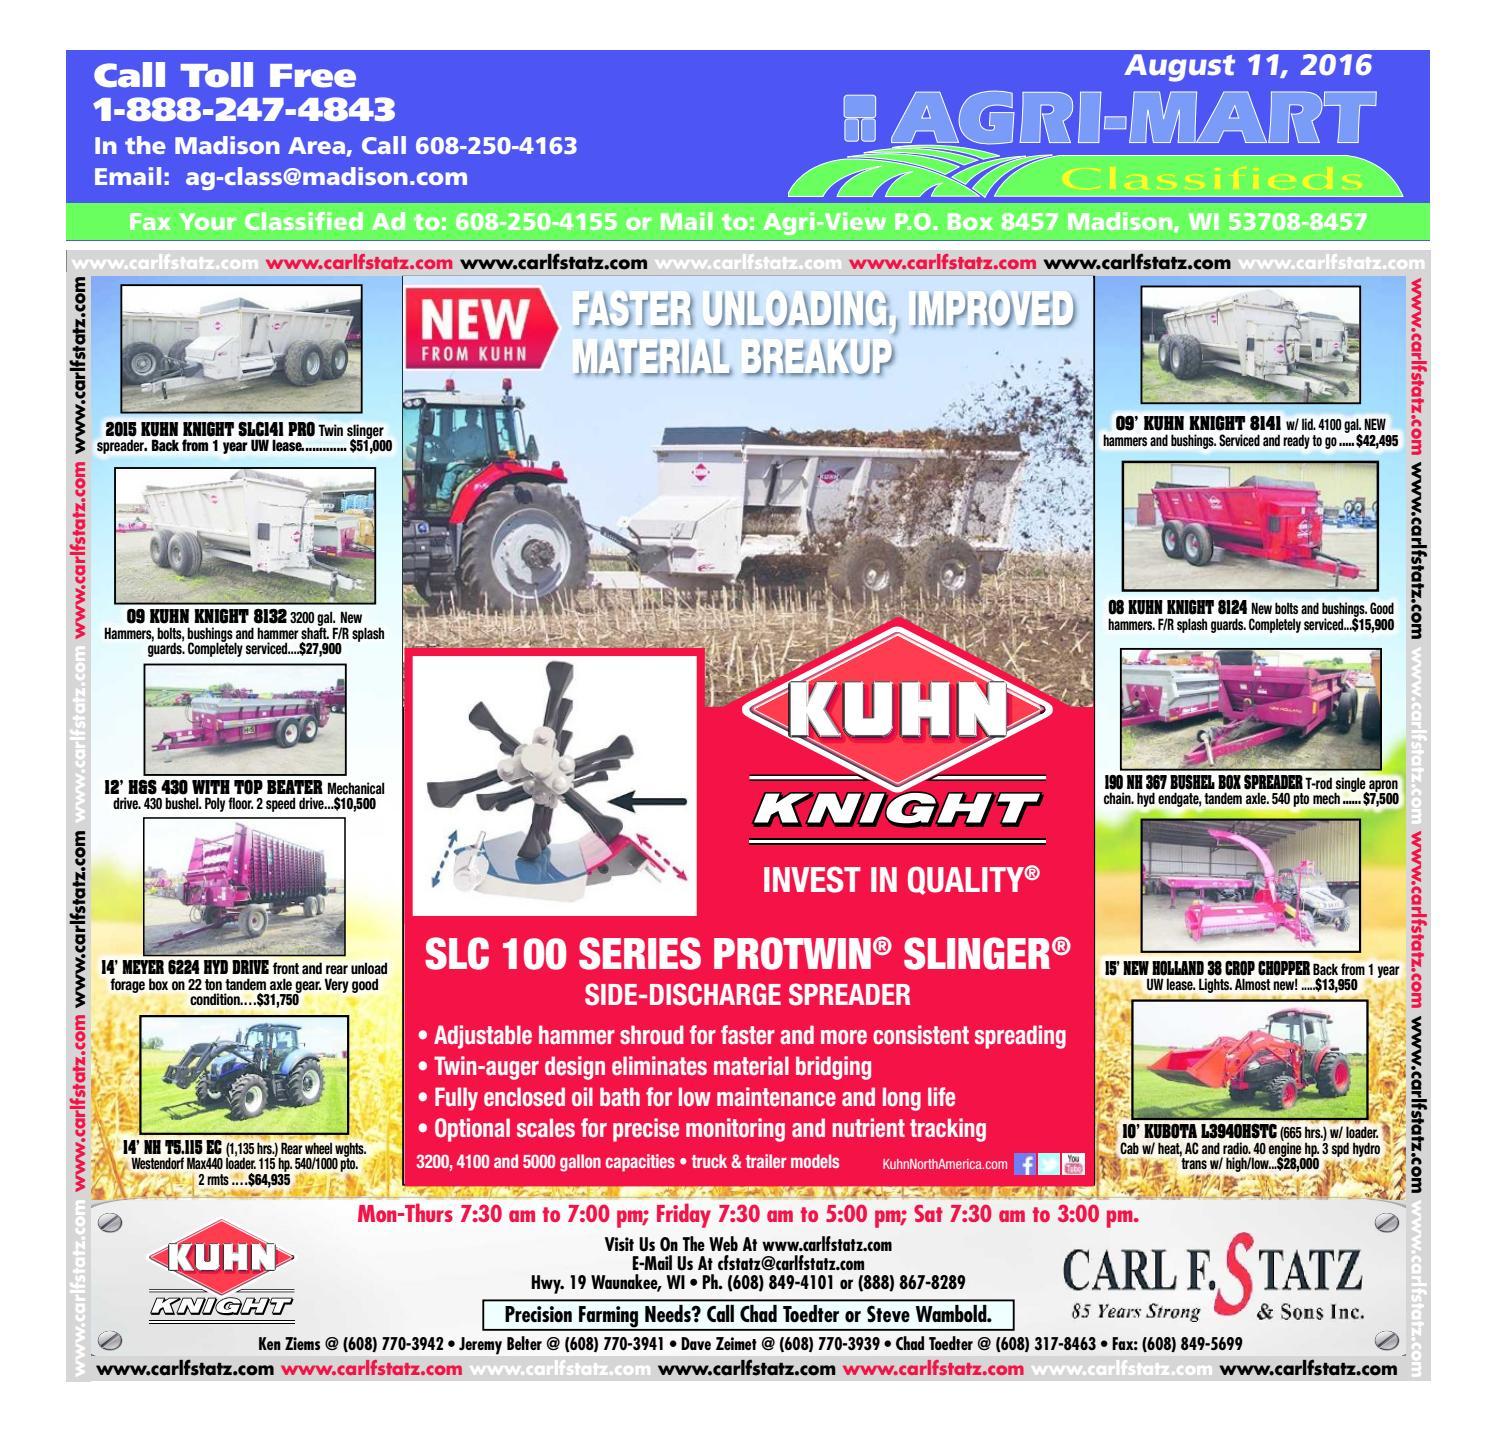 Aug 11, 2016 Agri-Mart by Madison com - issuu